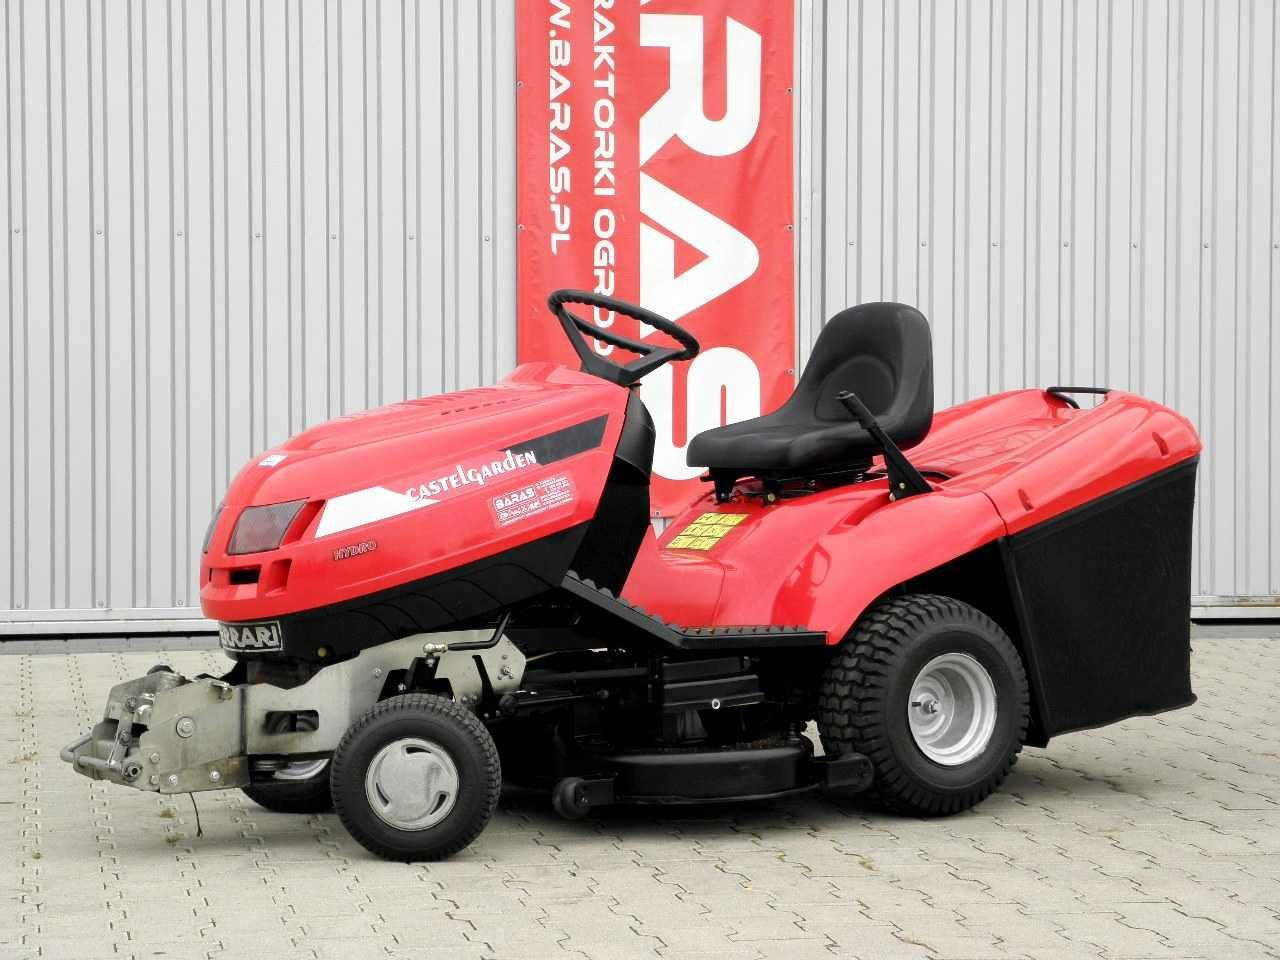 Traktorek kosiarka Castelgarden 22KM (160901) - Baras